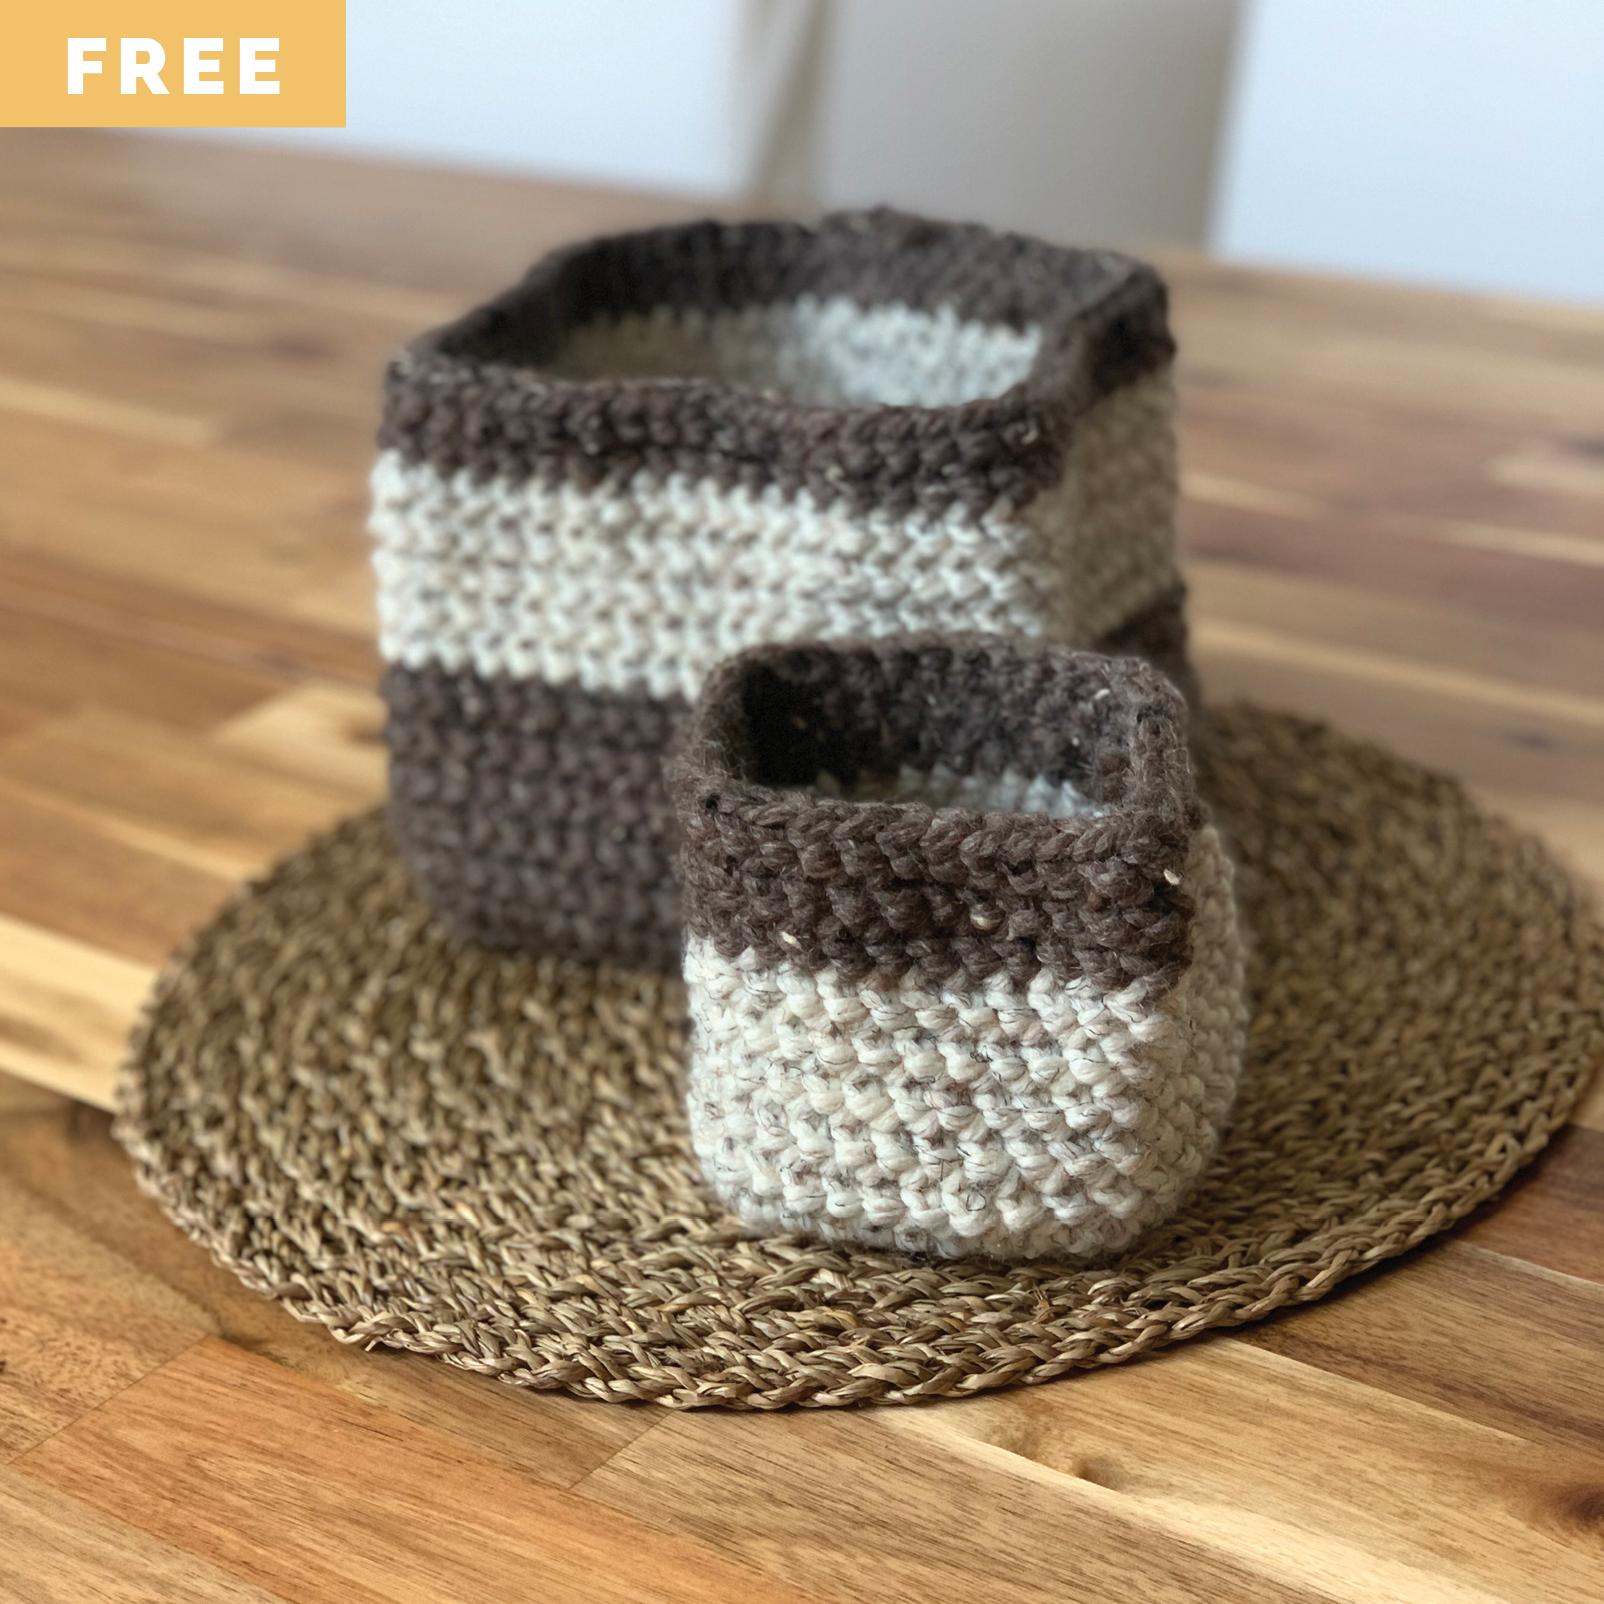 Free Crochet Pattern - Stacking Baskets